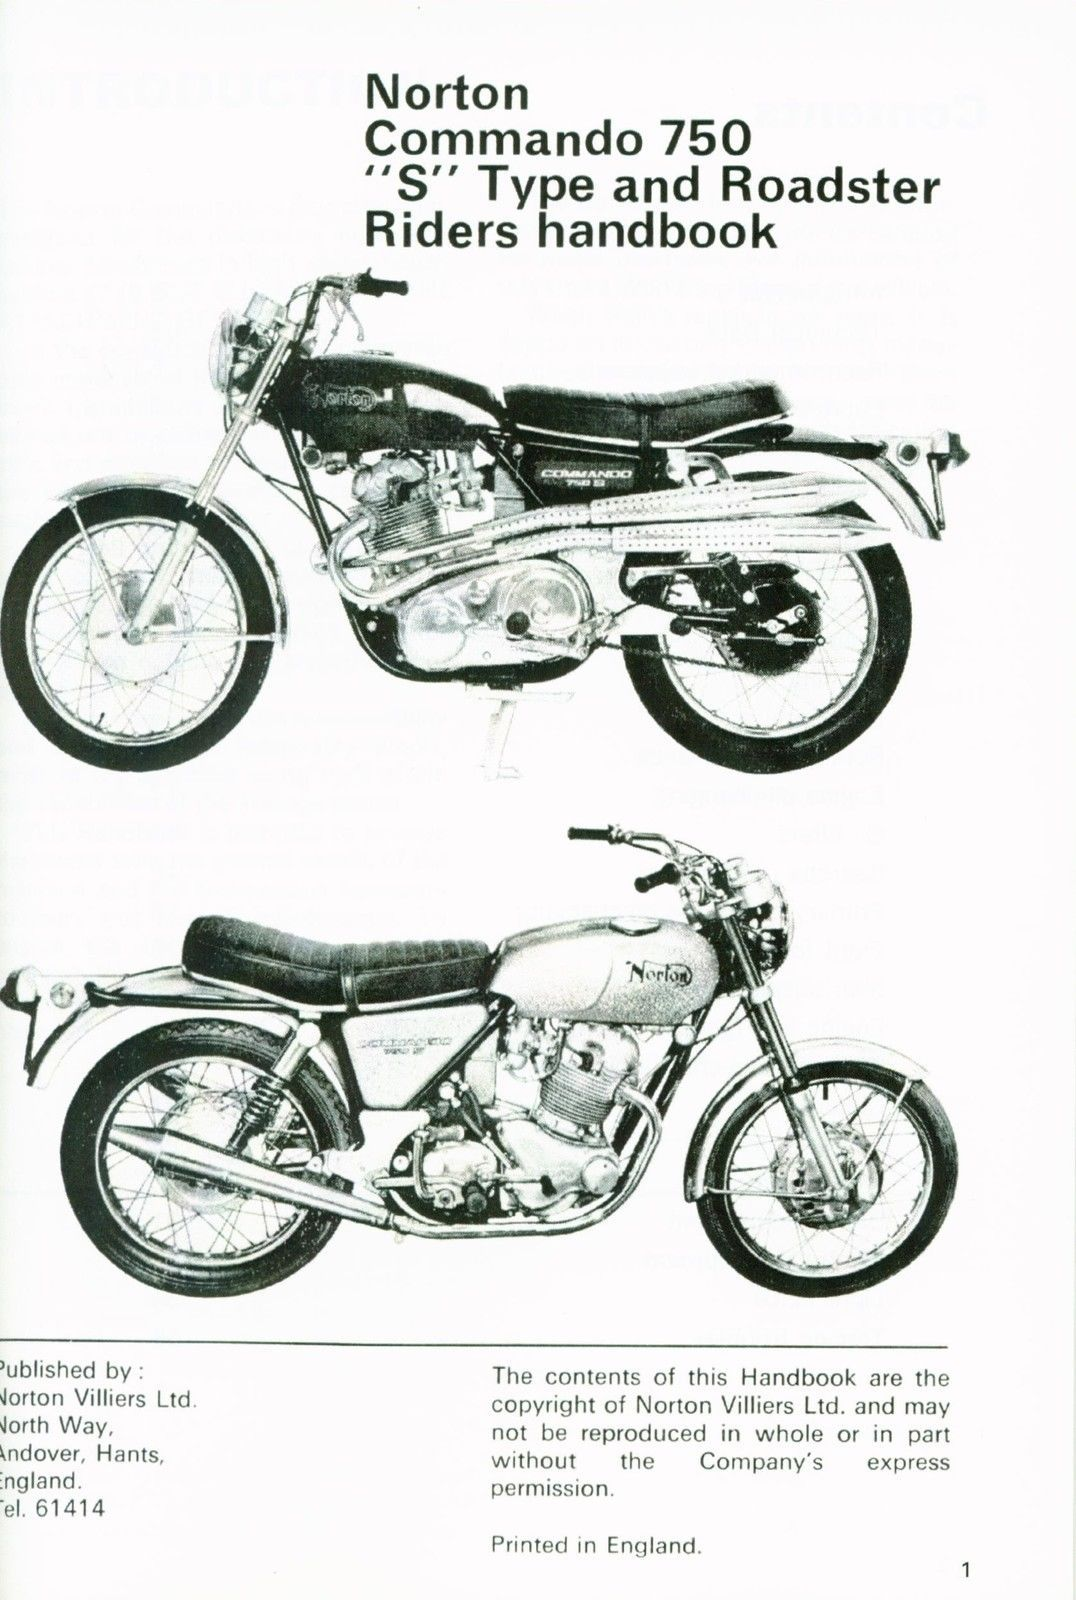 Norton Commando Roadster and S Type Riders Handbook Manual 1969 750cc 06  7305   eBay